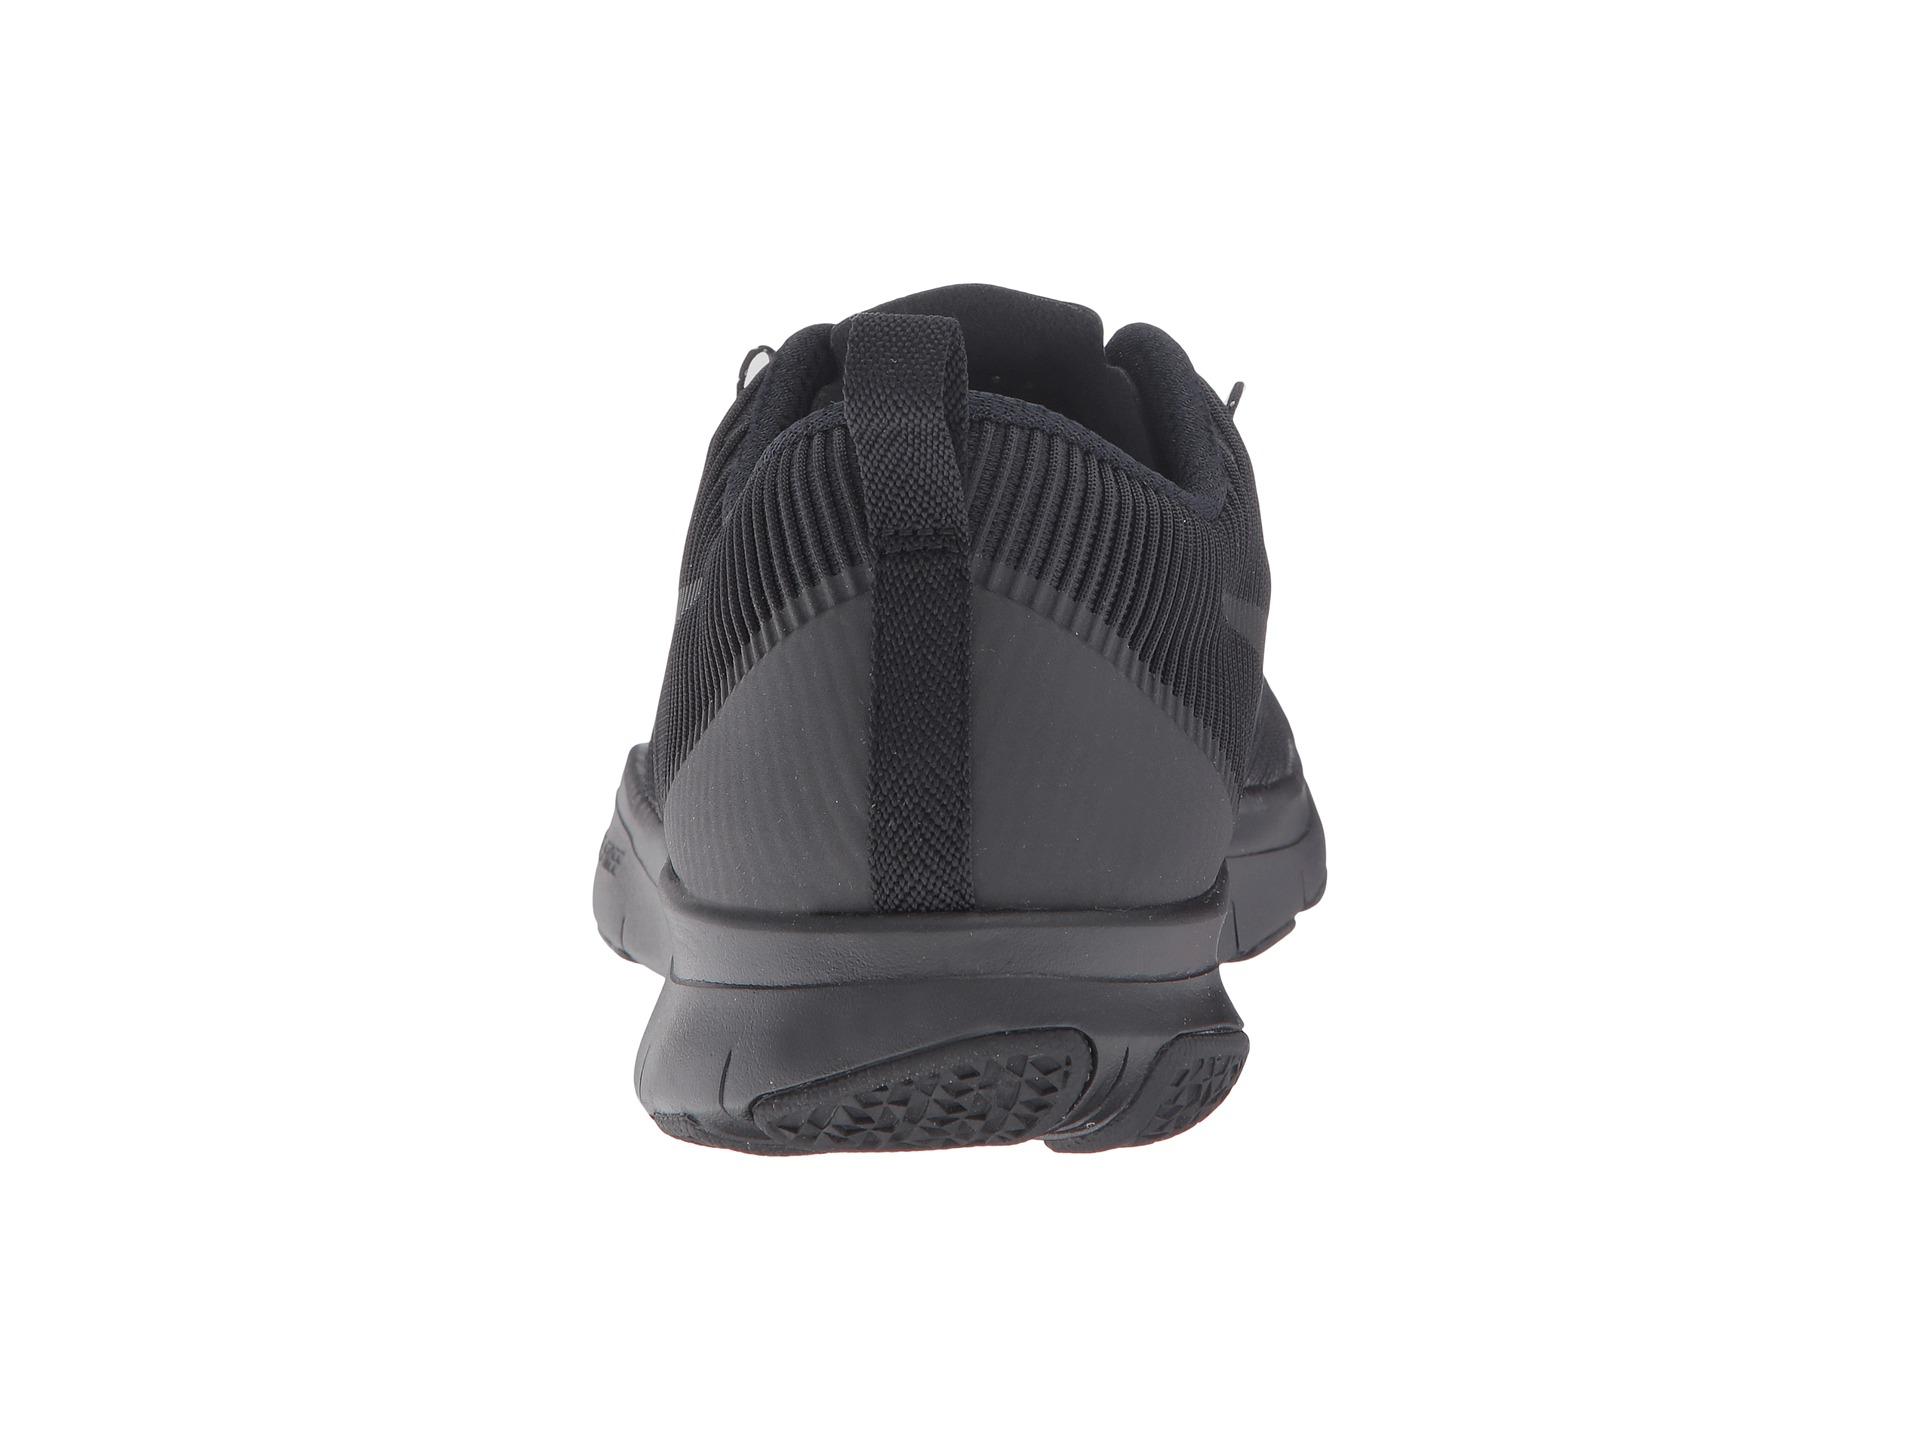 Zappos Nike Free Fit 2 2 Fit e9e0be